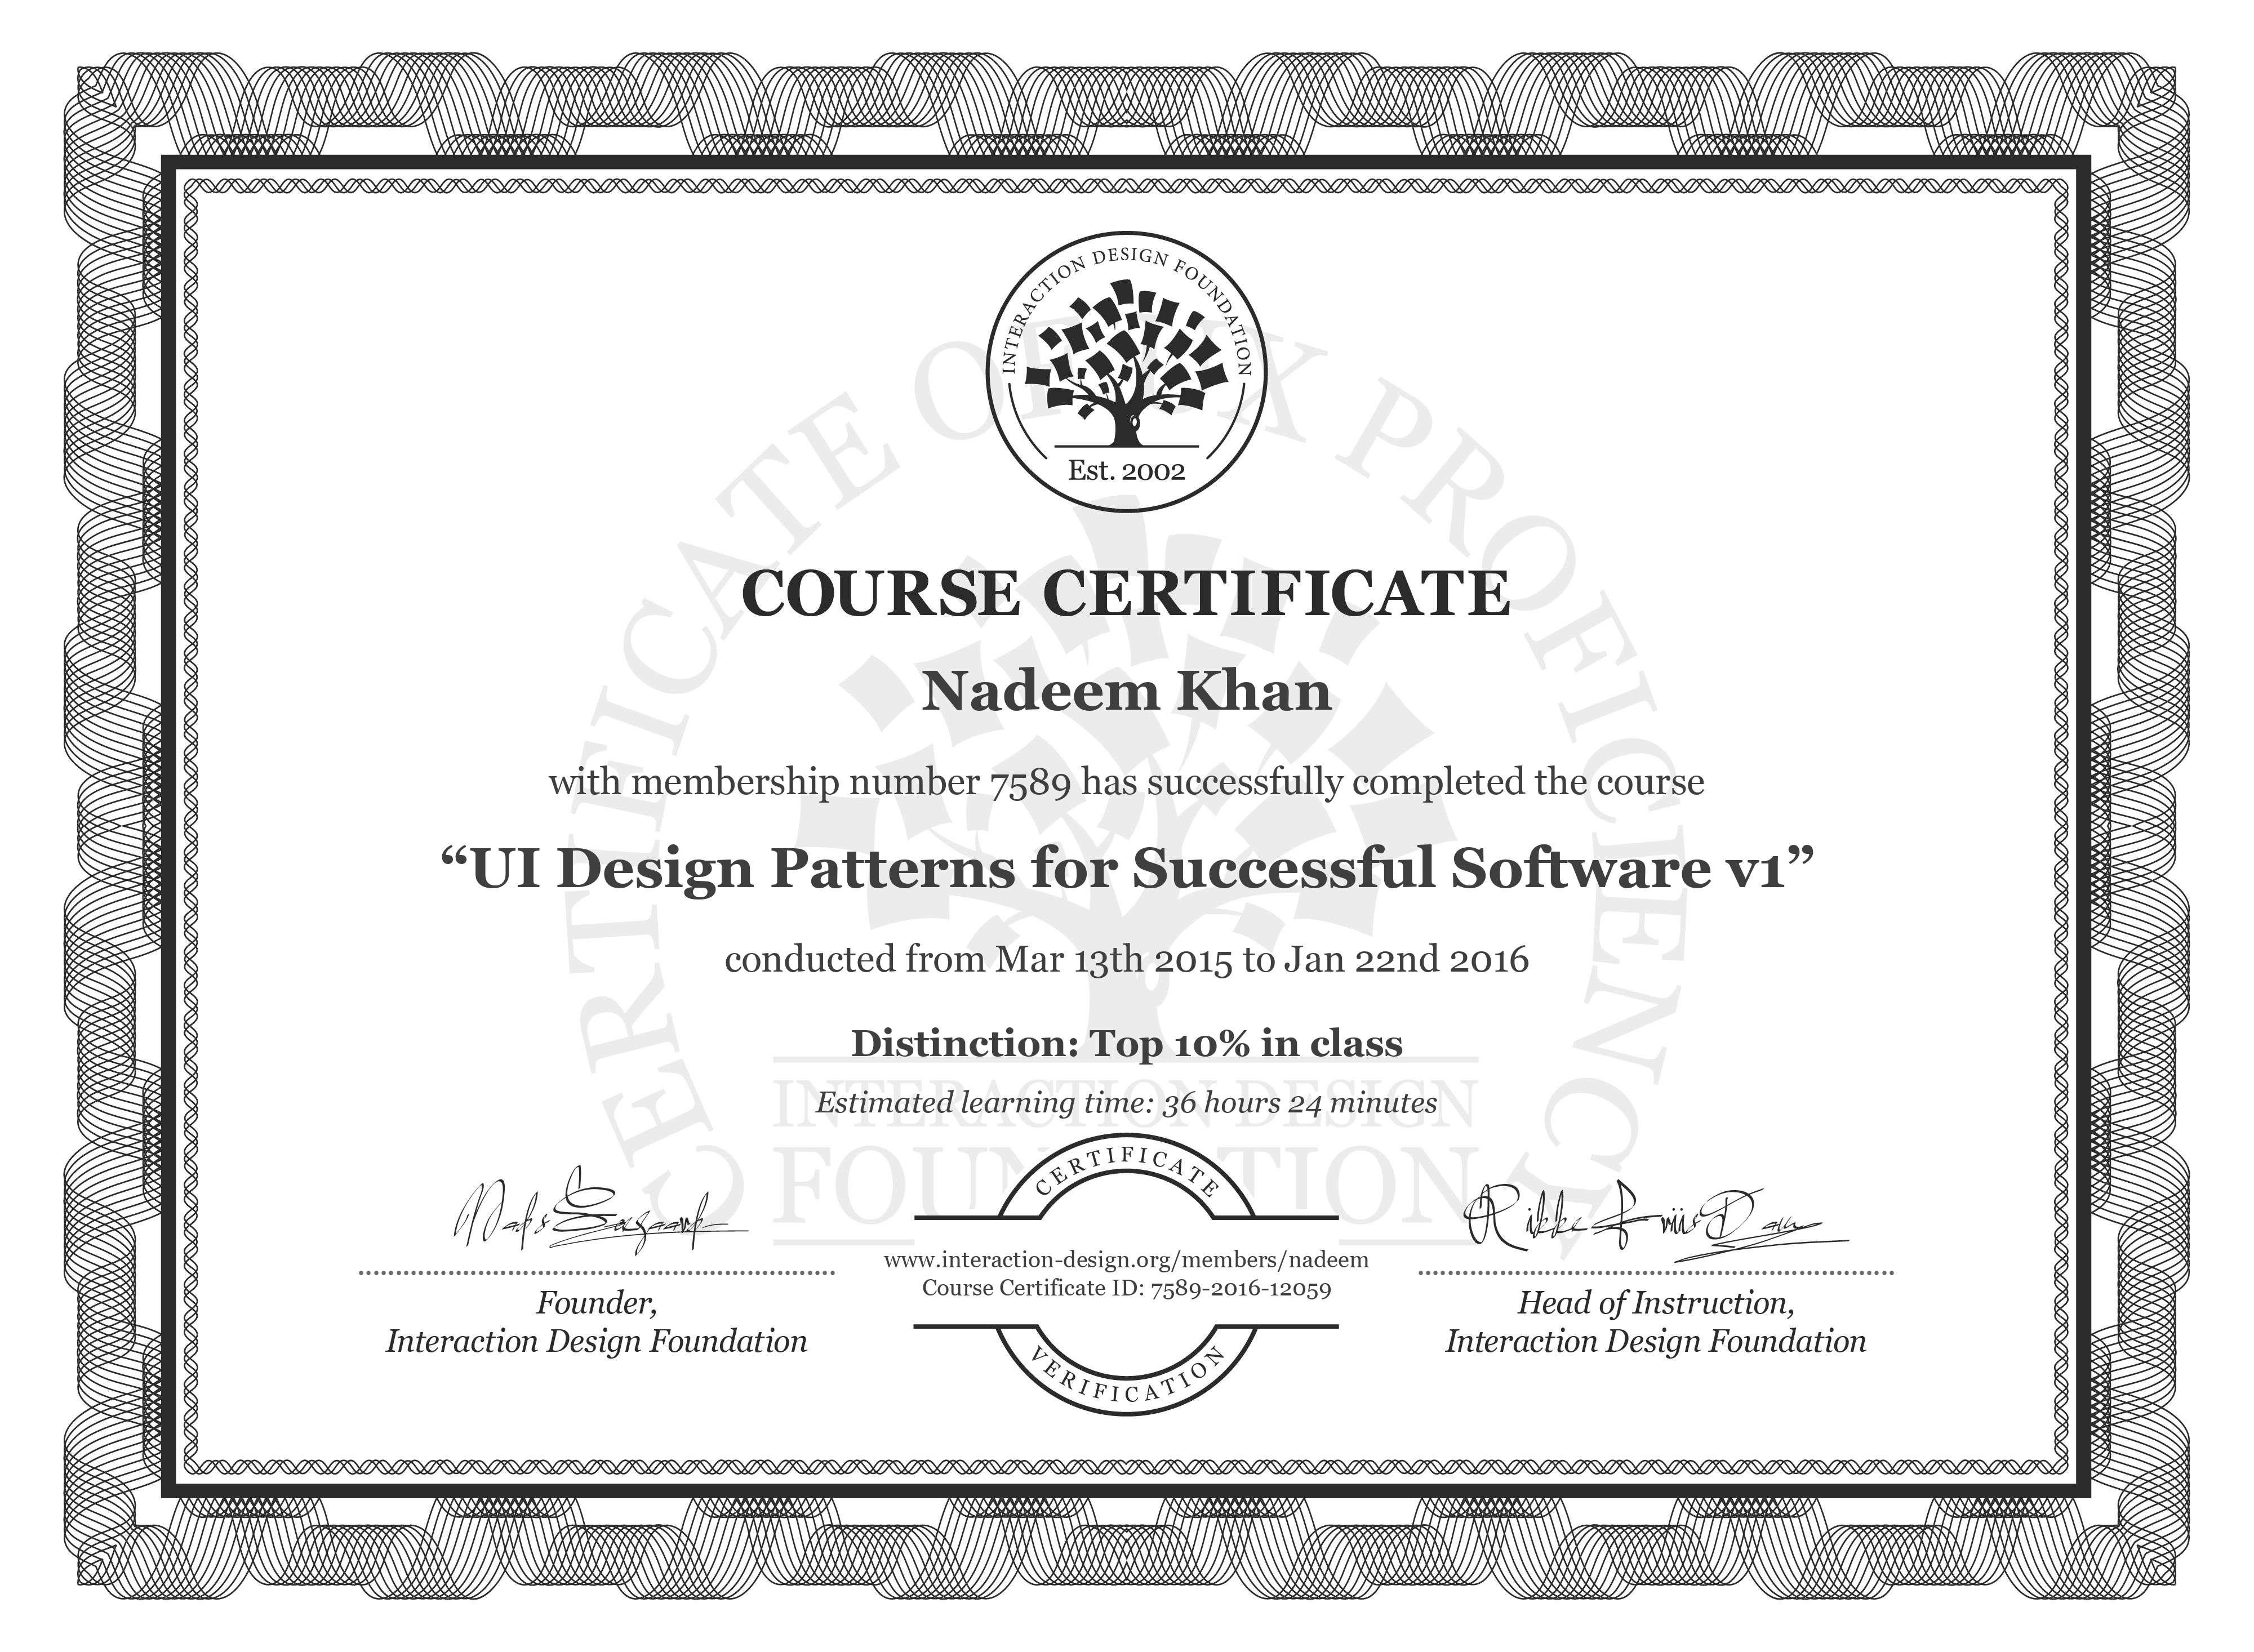 Nadeem Khan's Course Certificate: UI Design Patterns for Successful Software